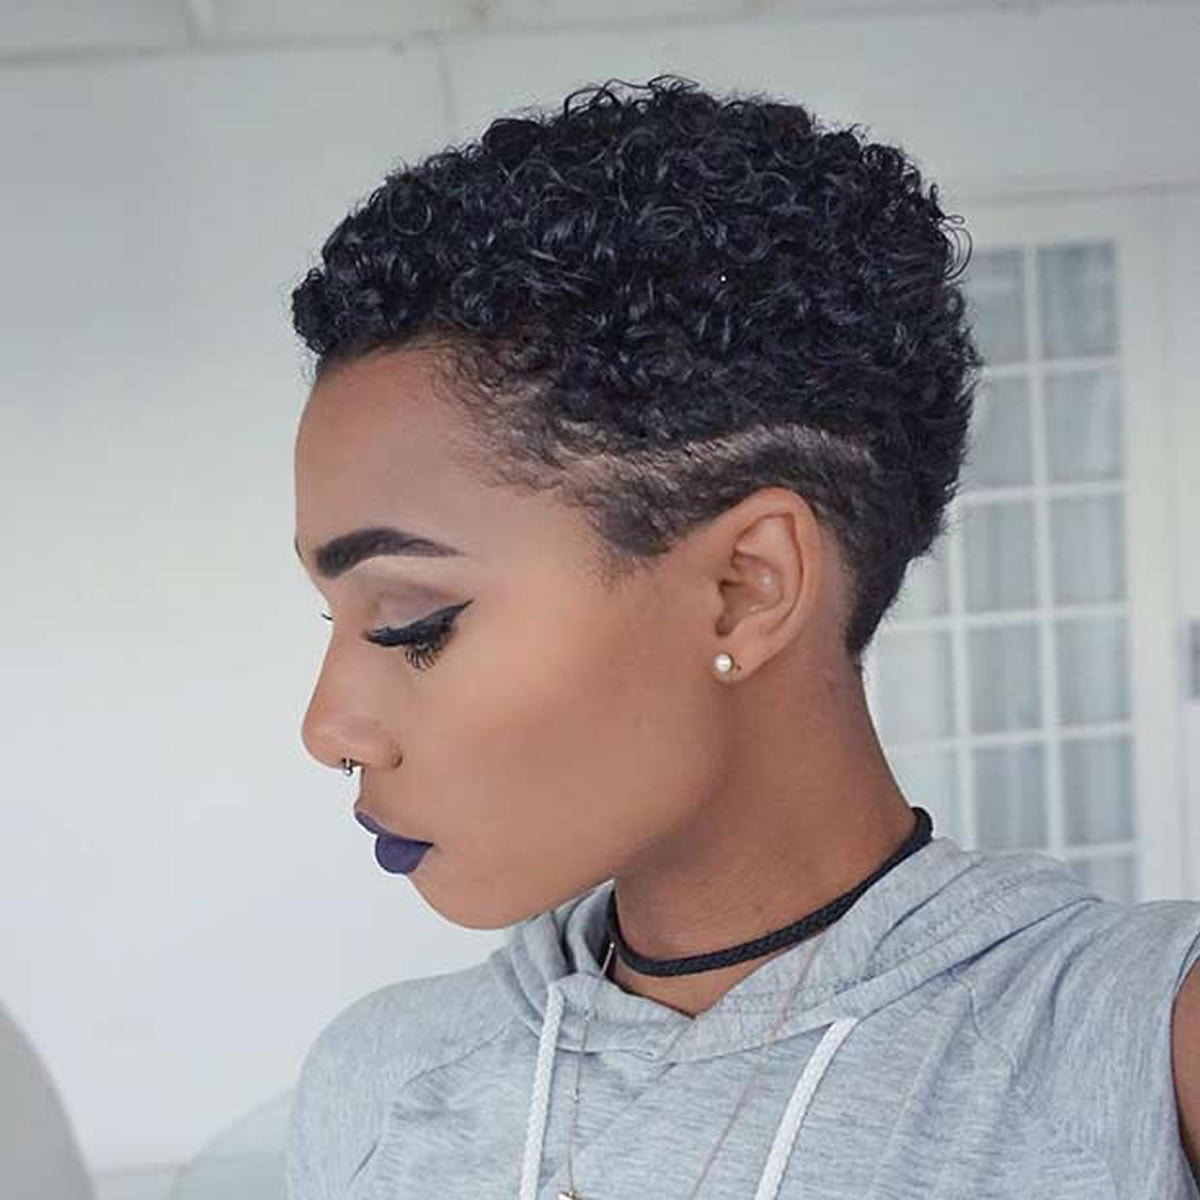 Pixie haircut 2019 for African American Women | Black hair ...